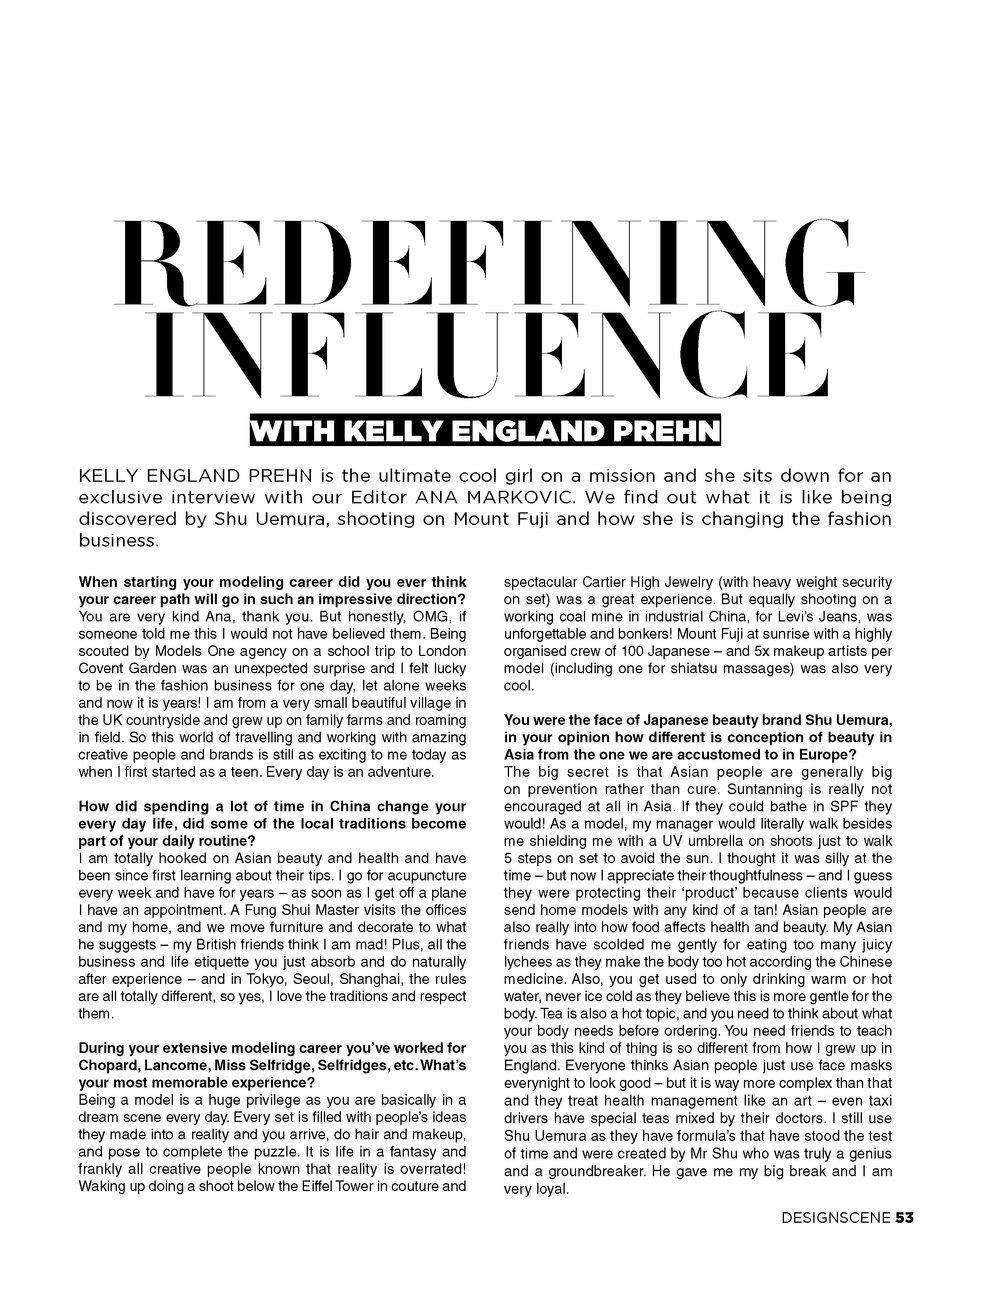 Design Scene Editorial